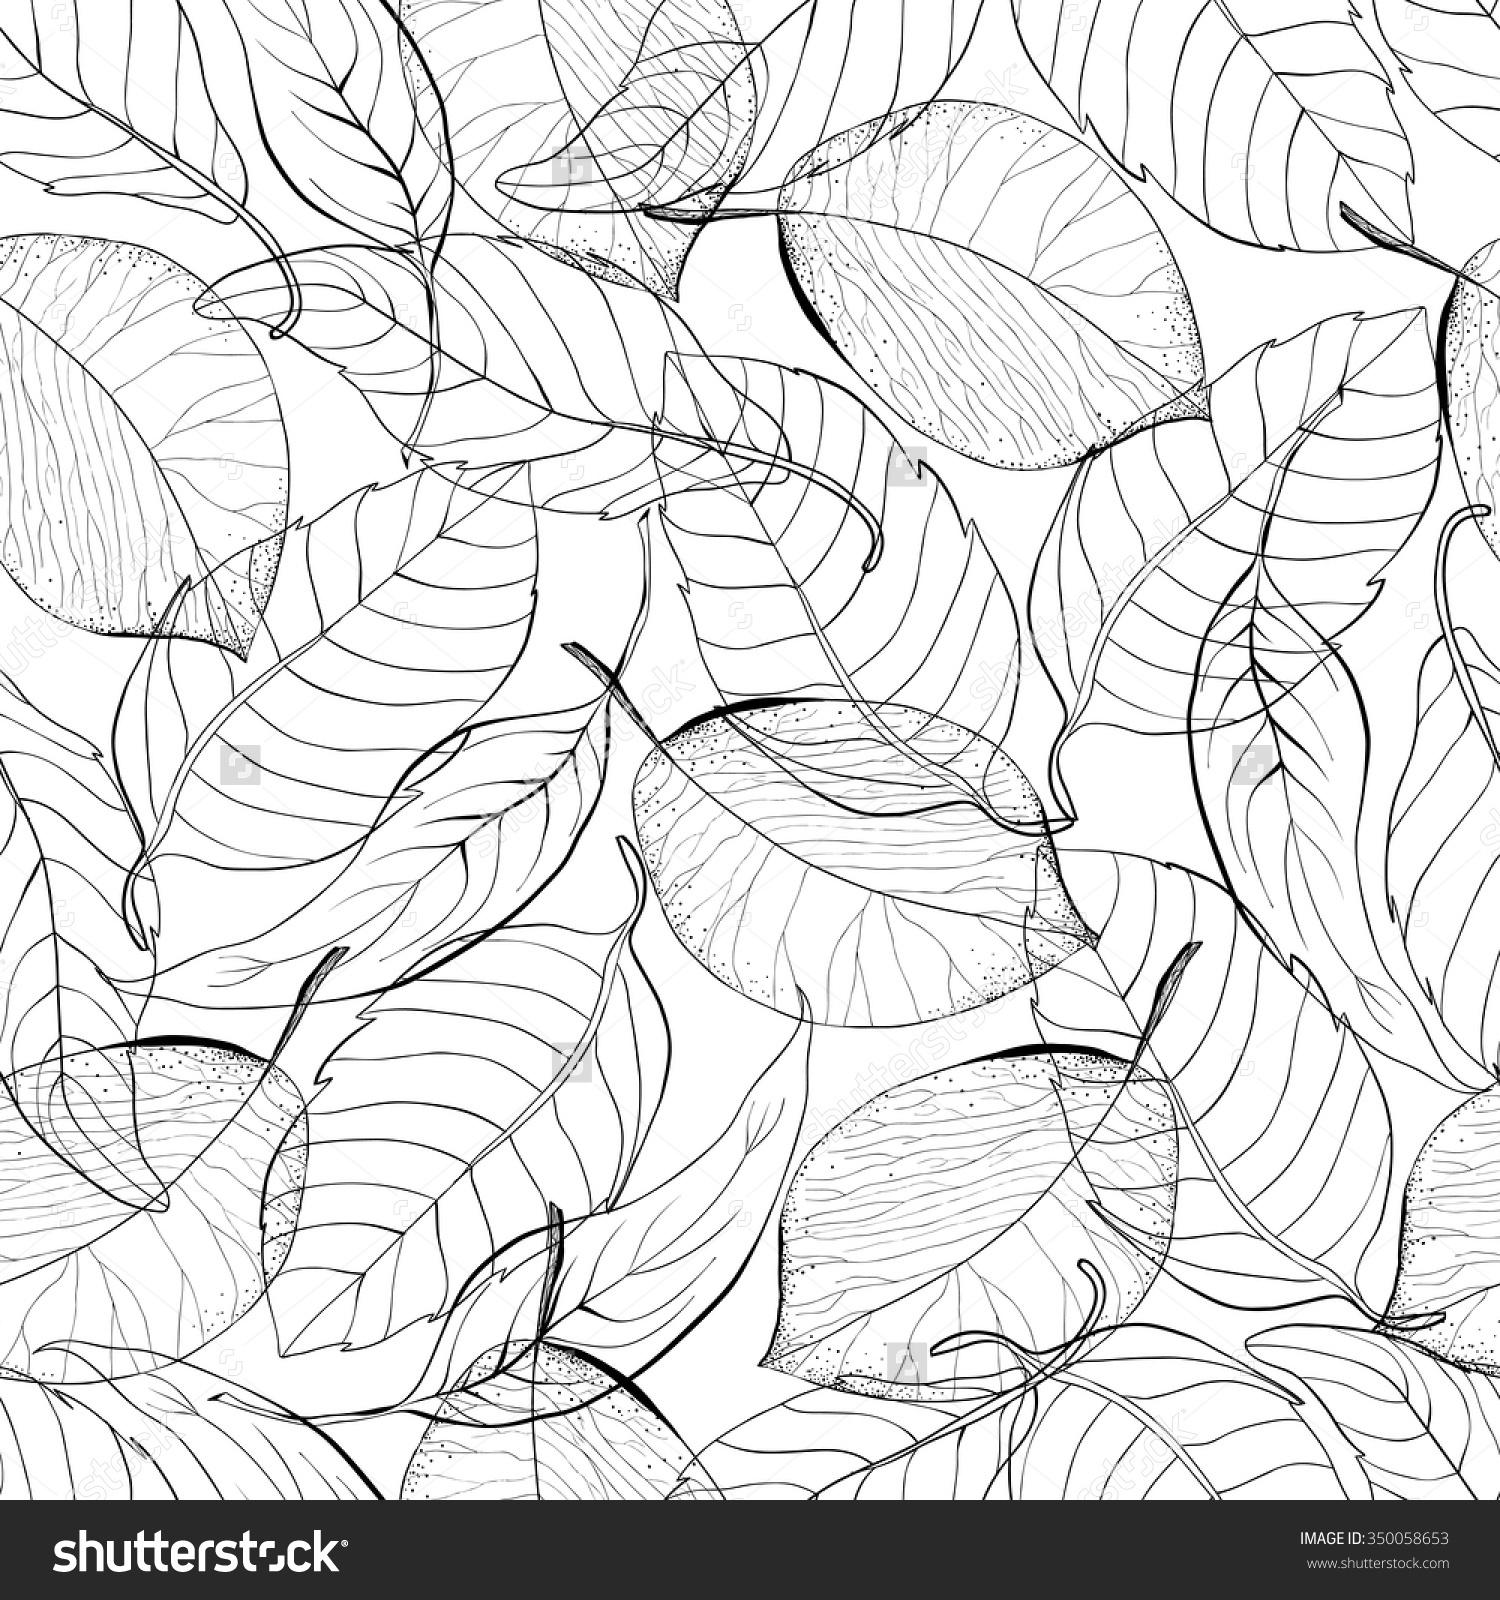 1500x1600 Simple Drawing Natural Simple Drawing Natural